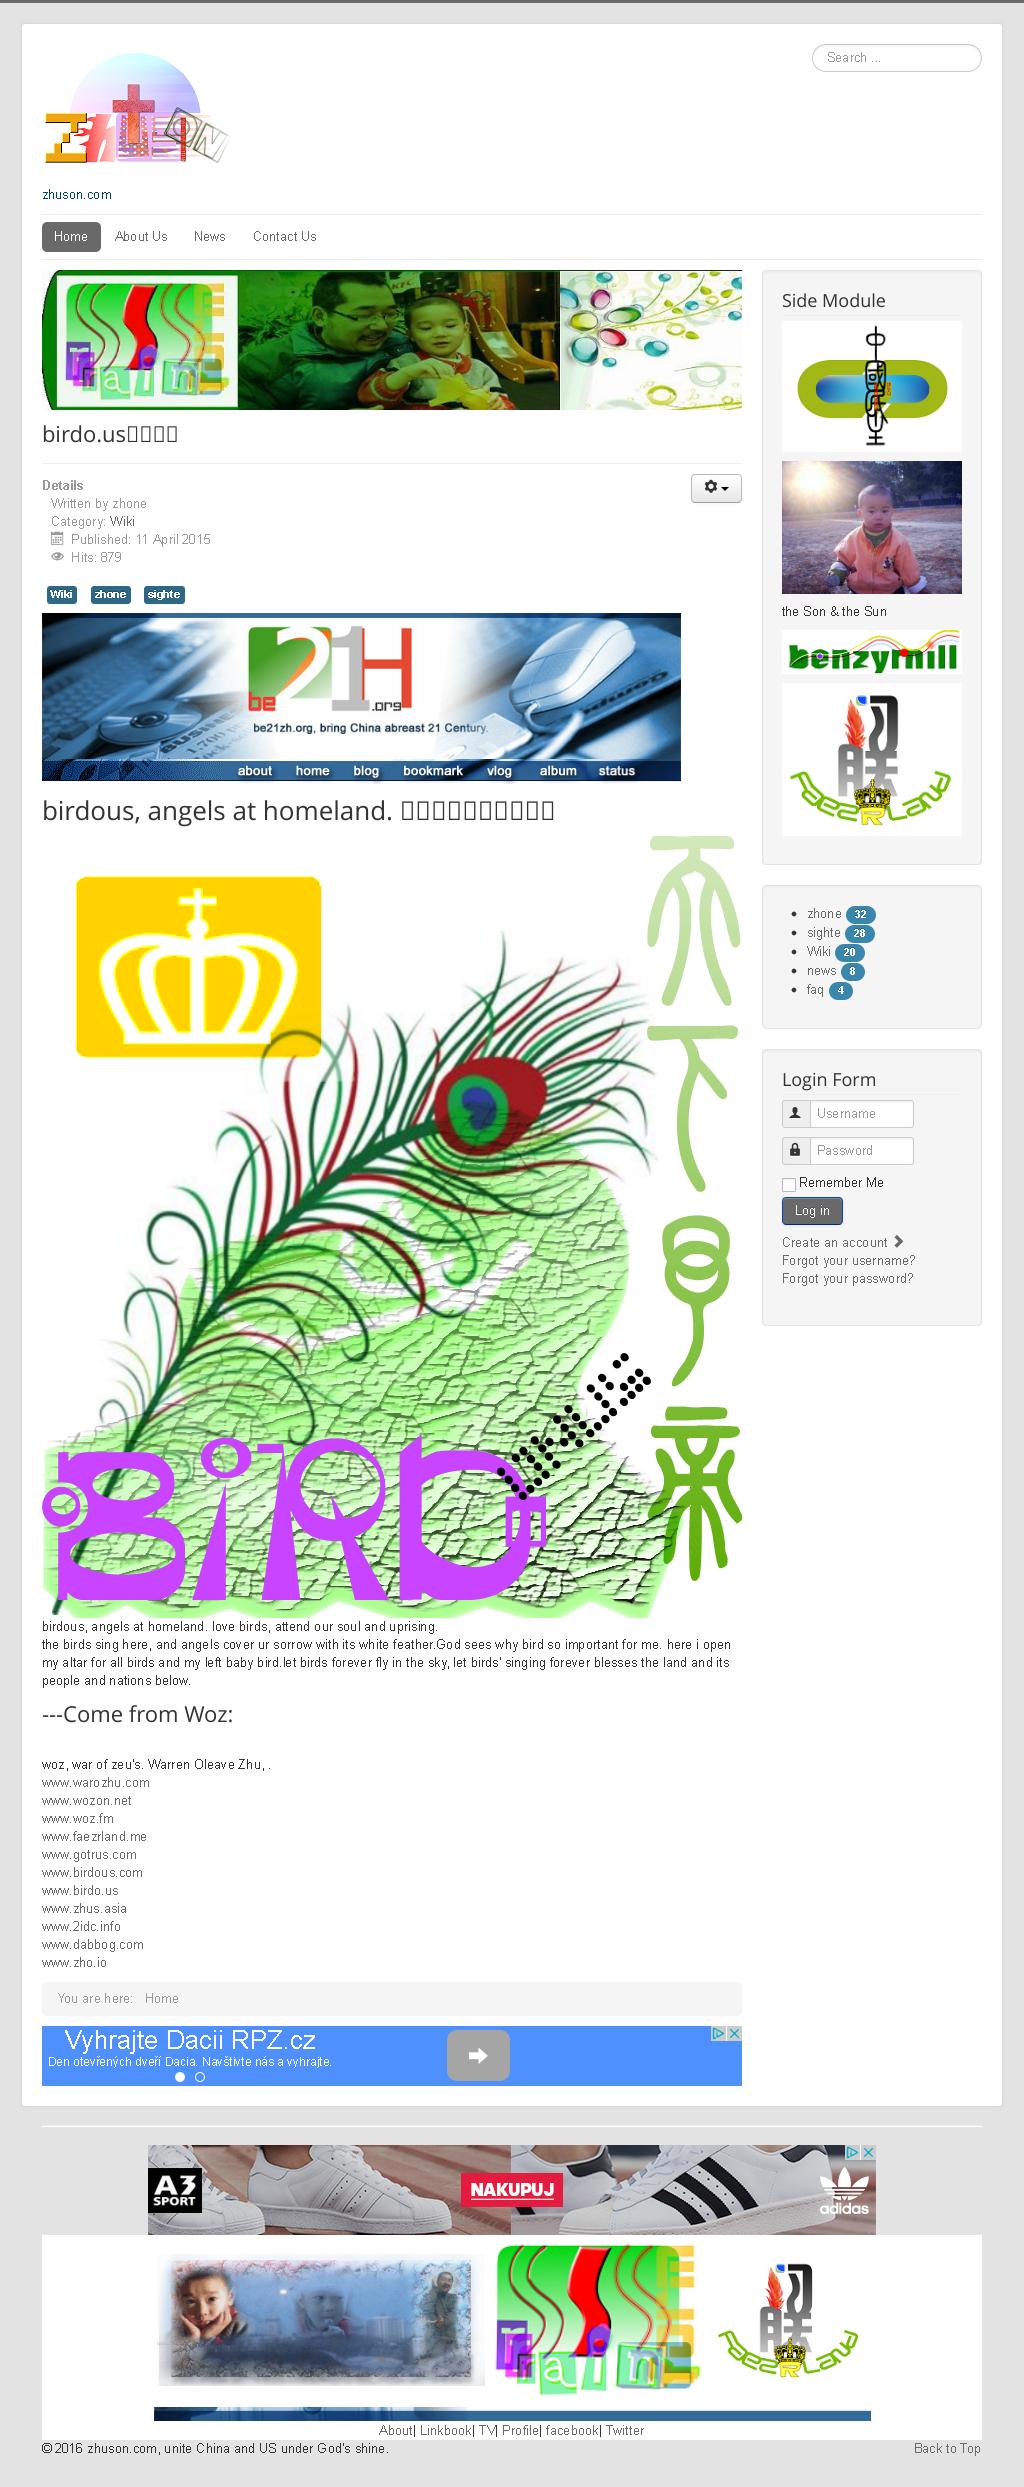 brand new zhuson.com dynamic site after web app setup.